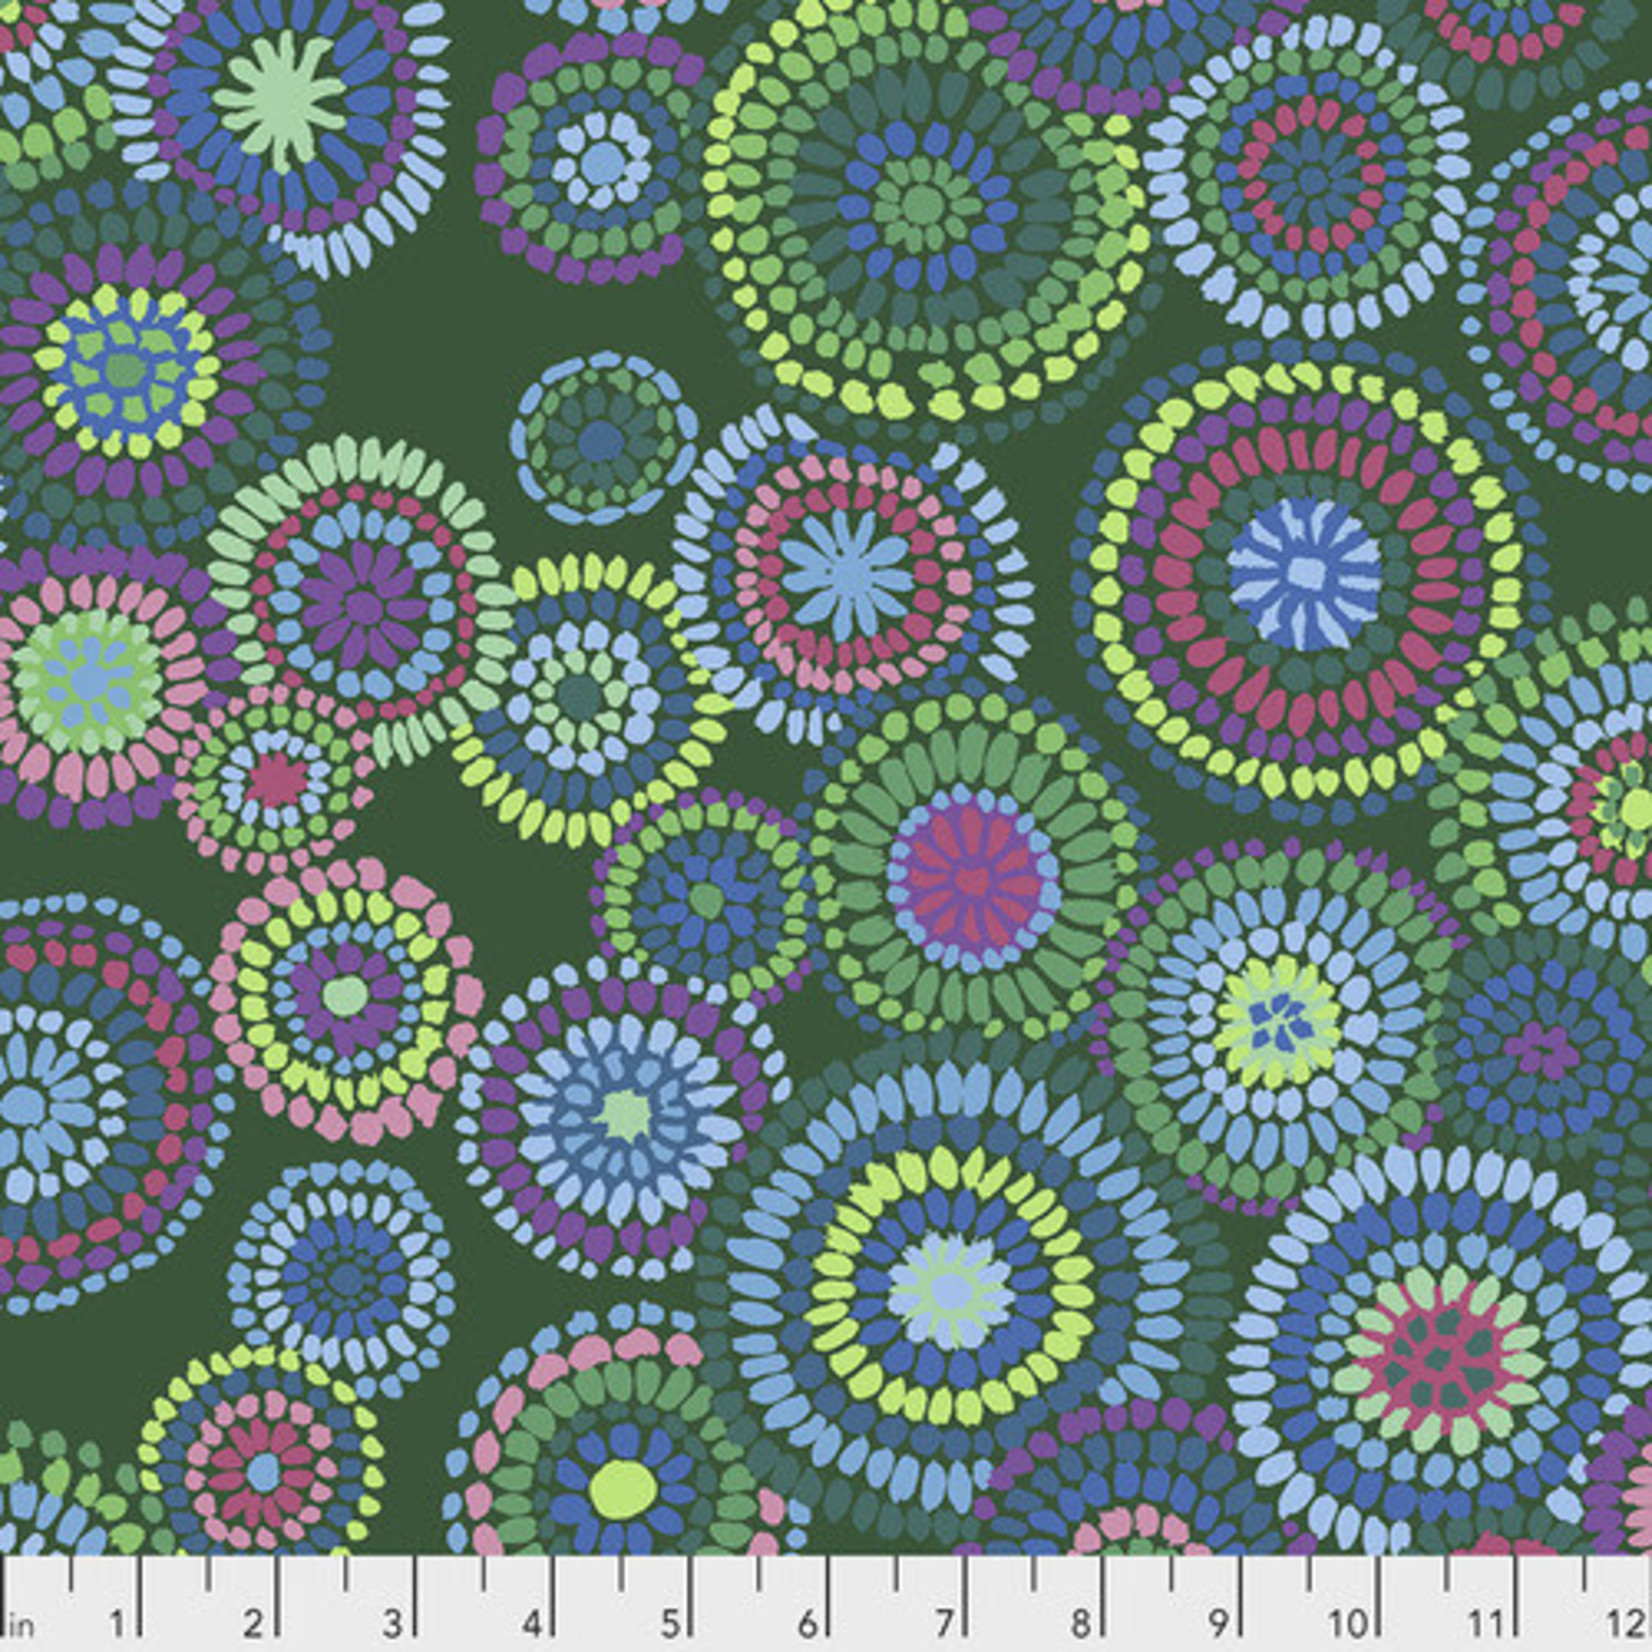 Kaffe Fassett KF Collective - Mosaic Circles, Green (PWGP176.GREEN) $0.18 per cm or $18/m